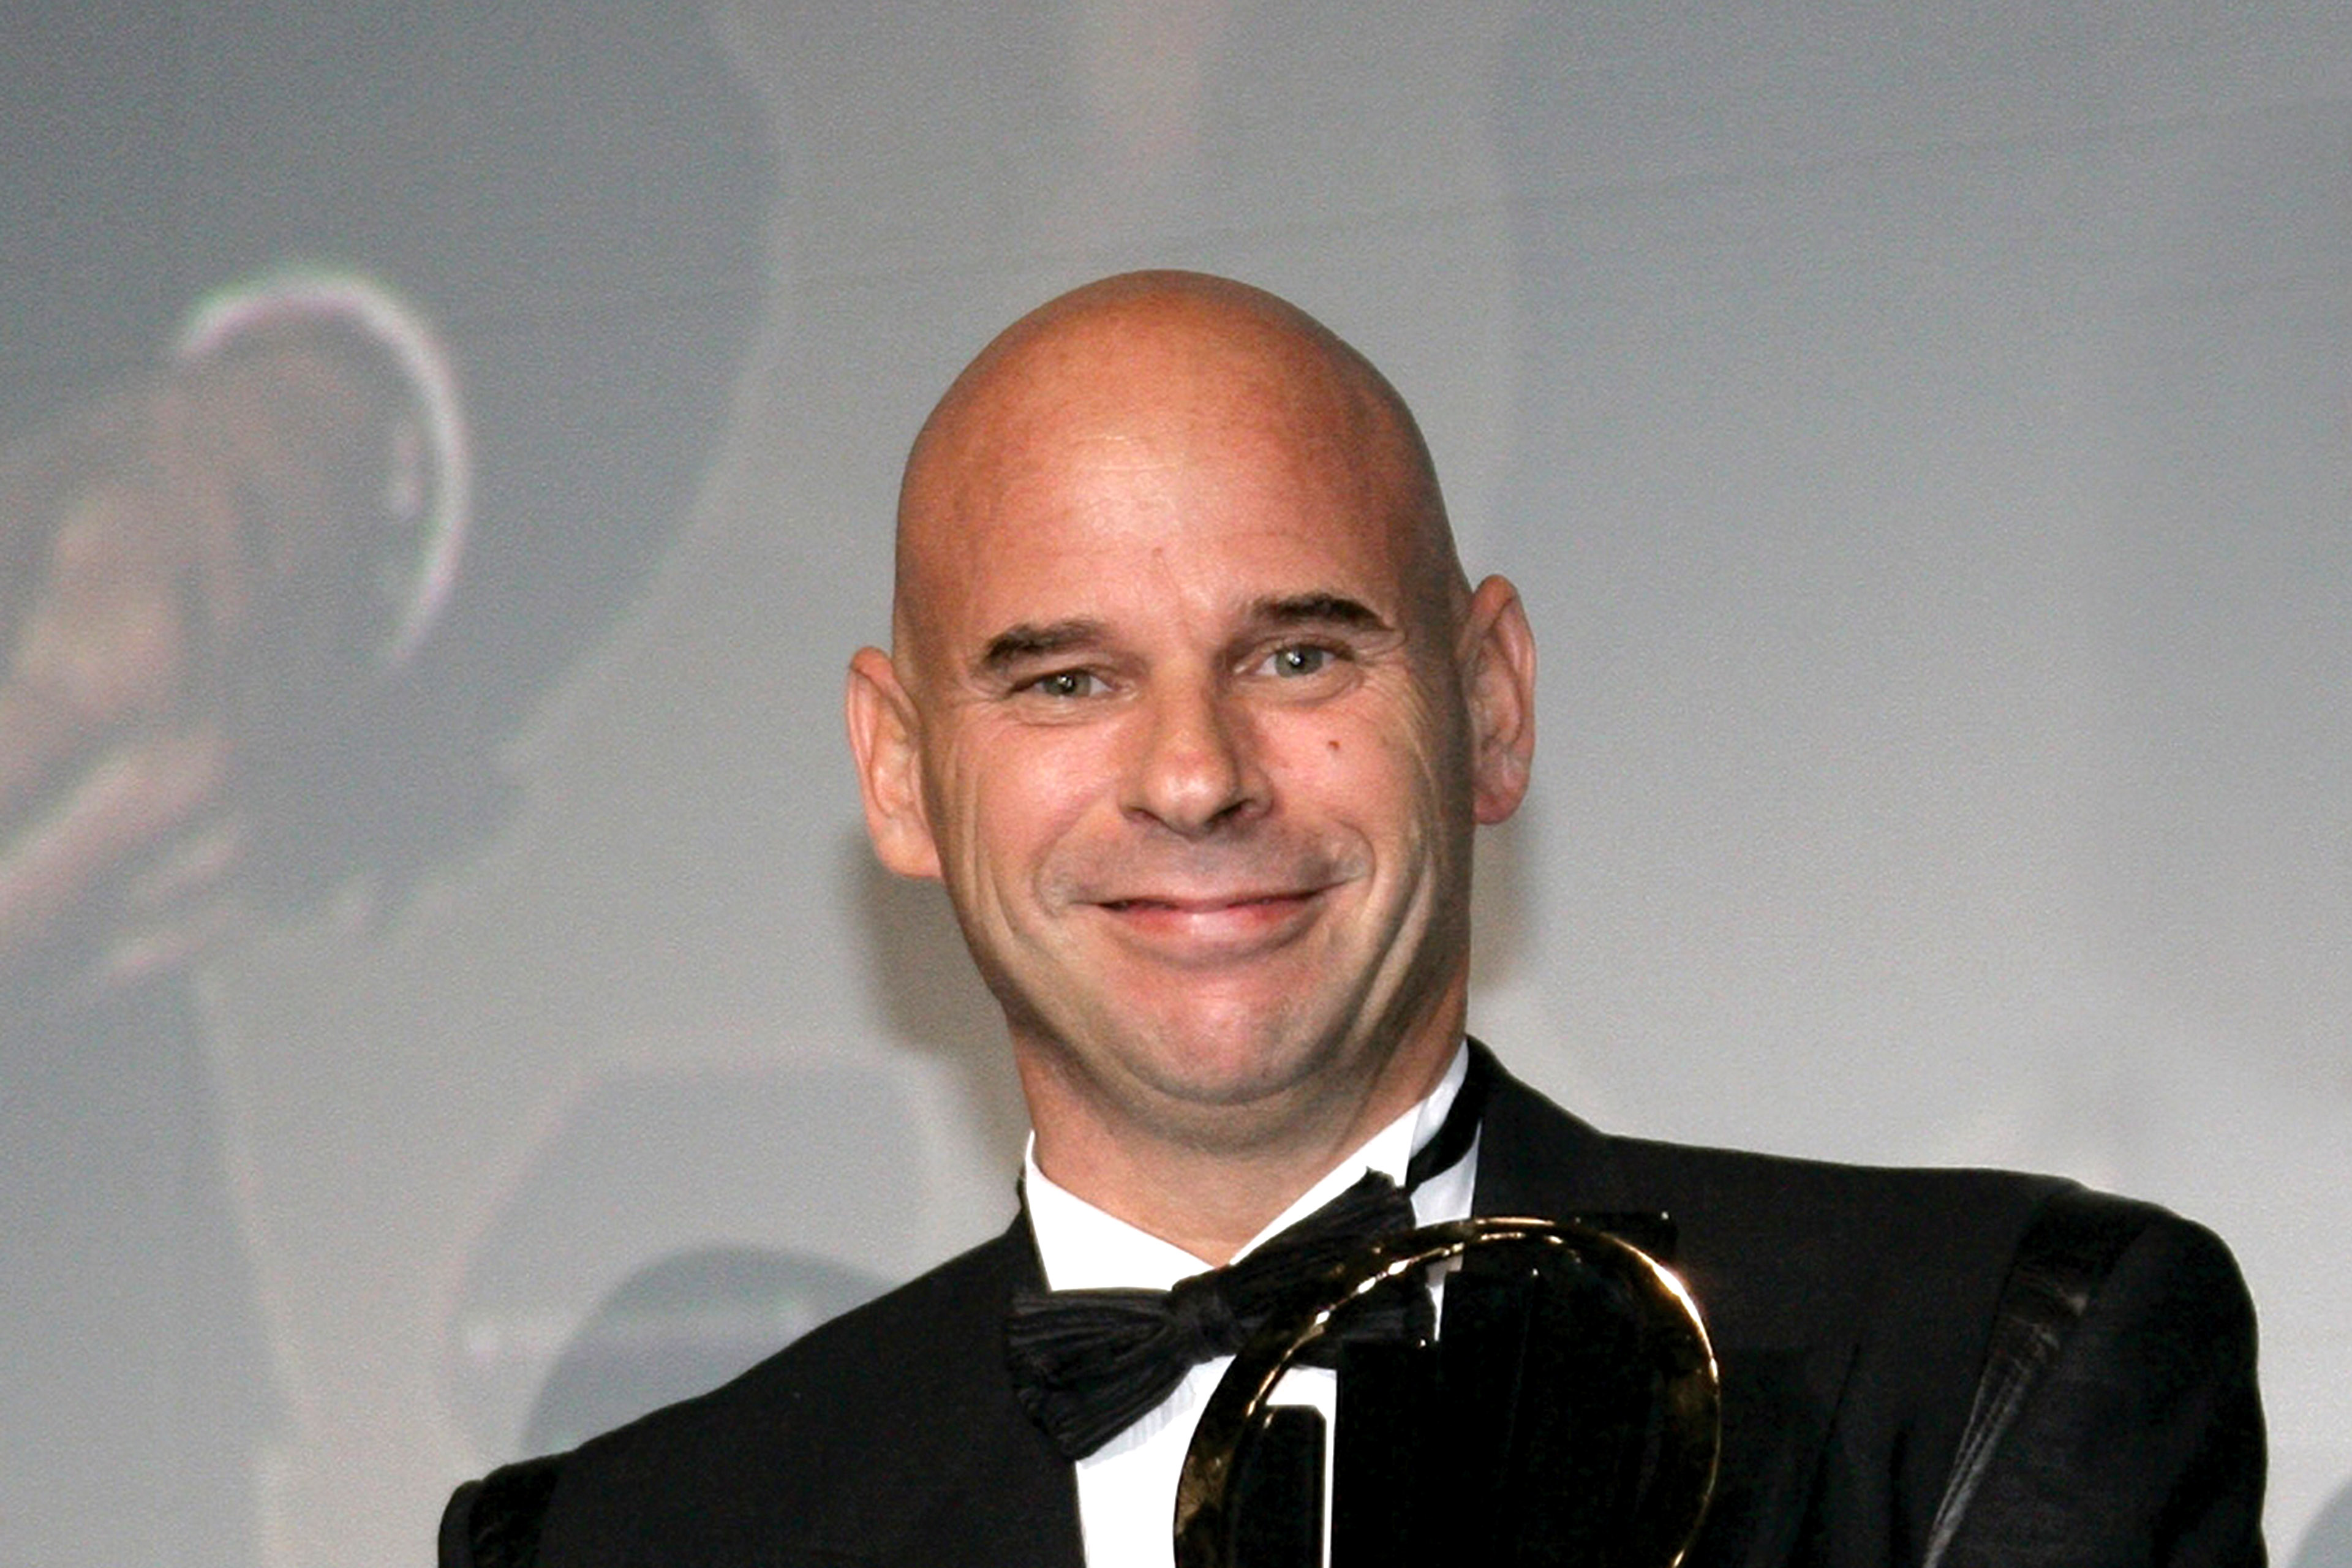 EY Guy Laliberté